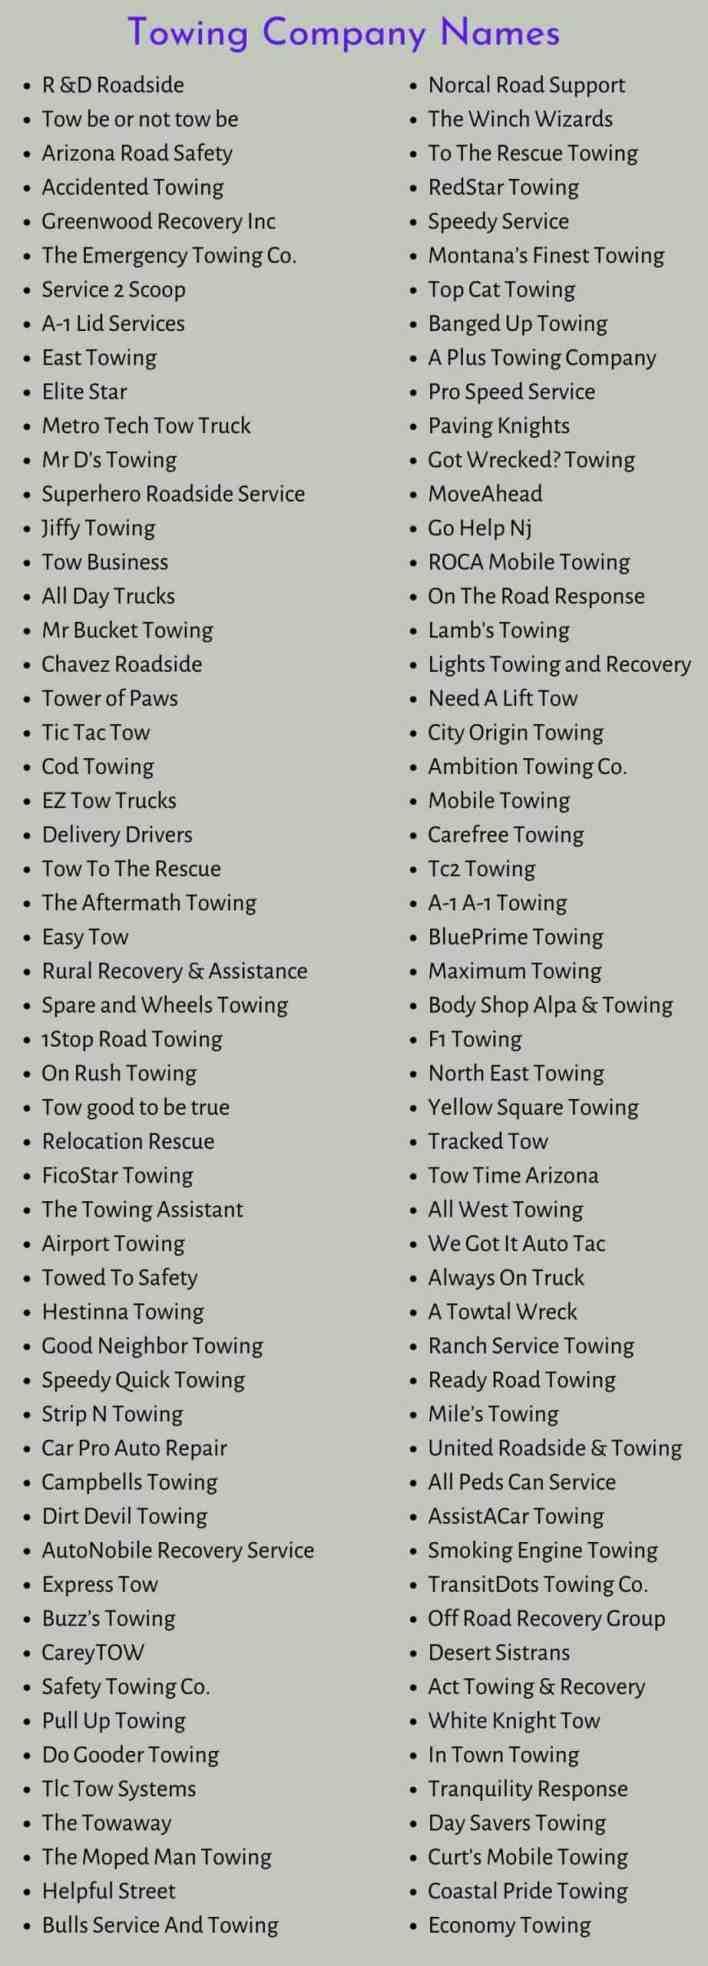 Towing Company Names